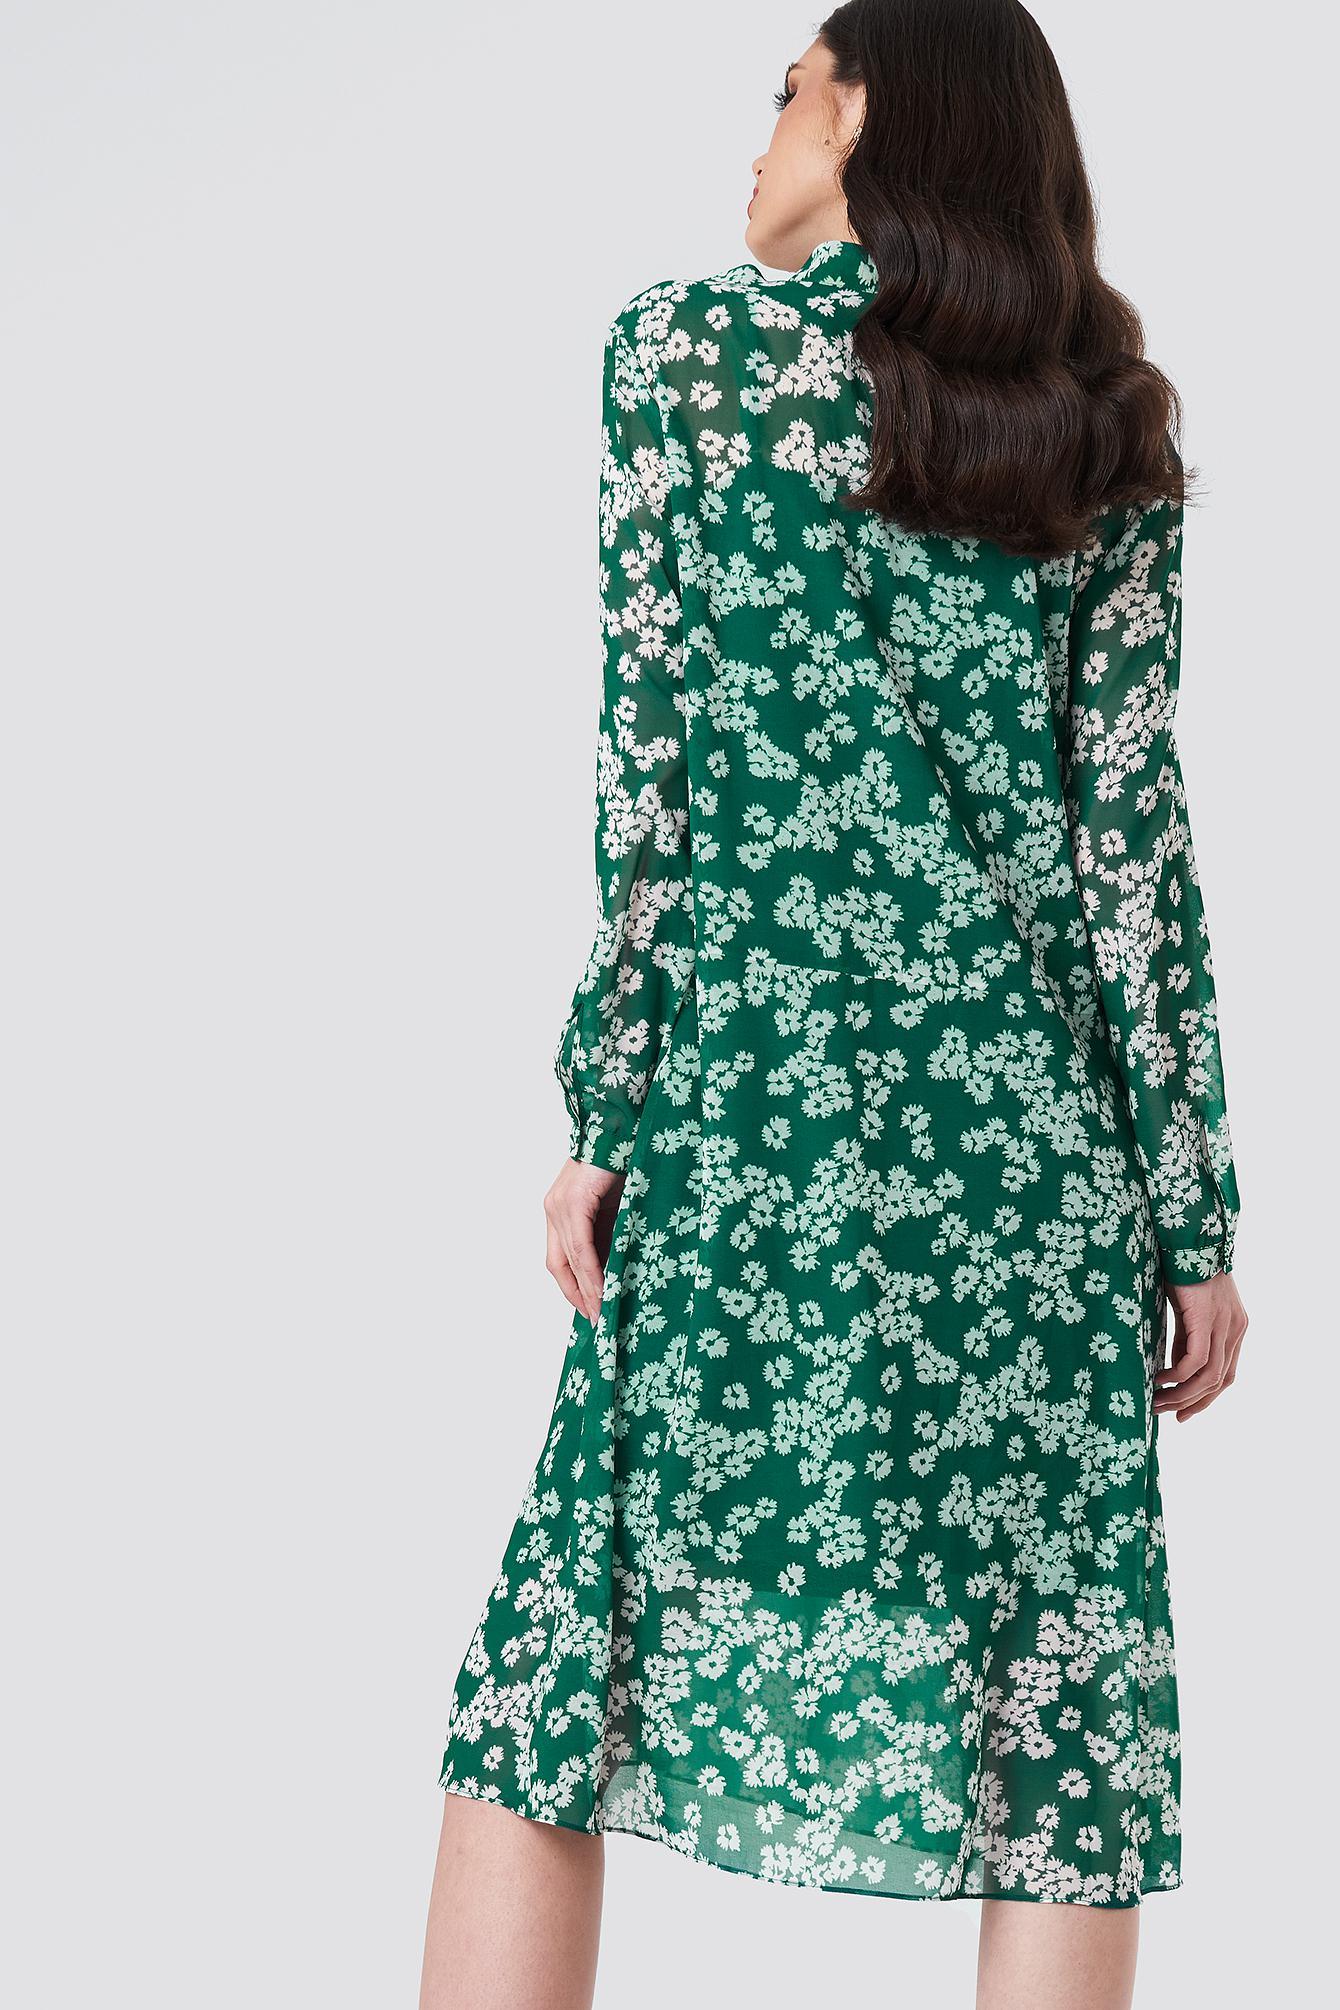 Green In Lyst Merritt amp; Samsøe Aop Daisy Dress Ls fp0qw